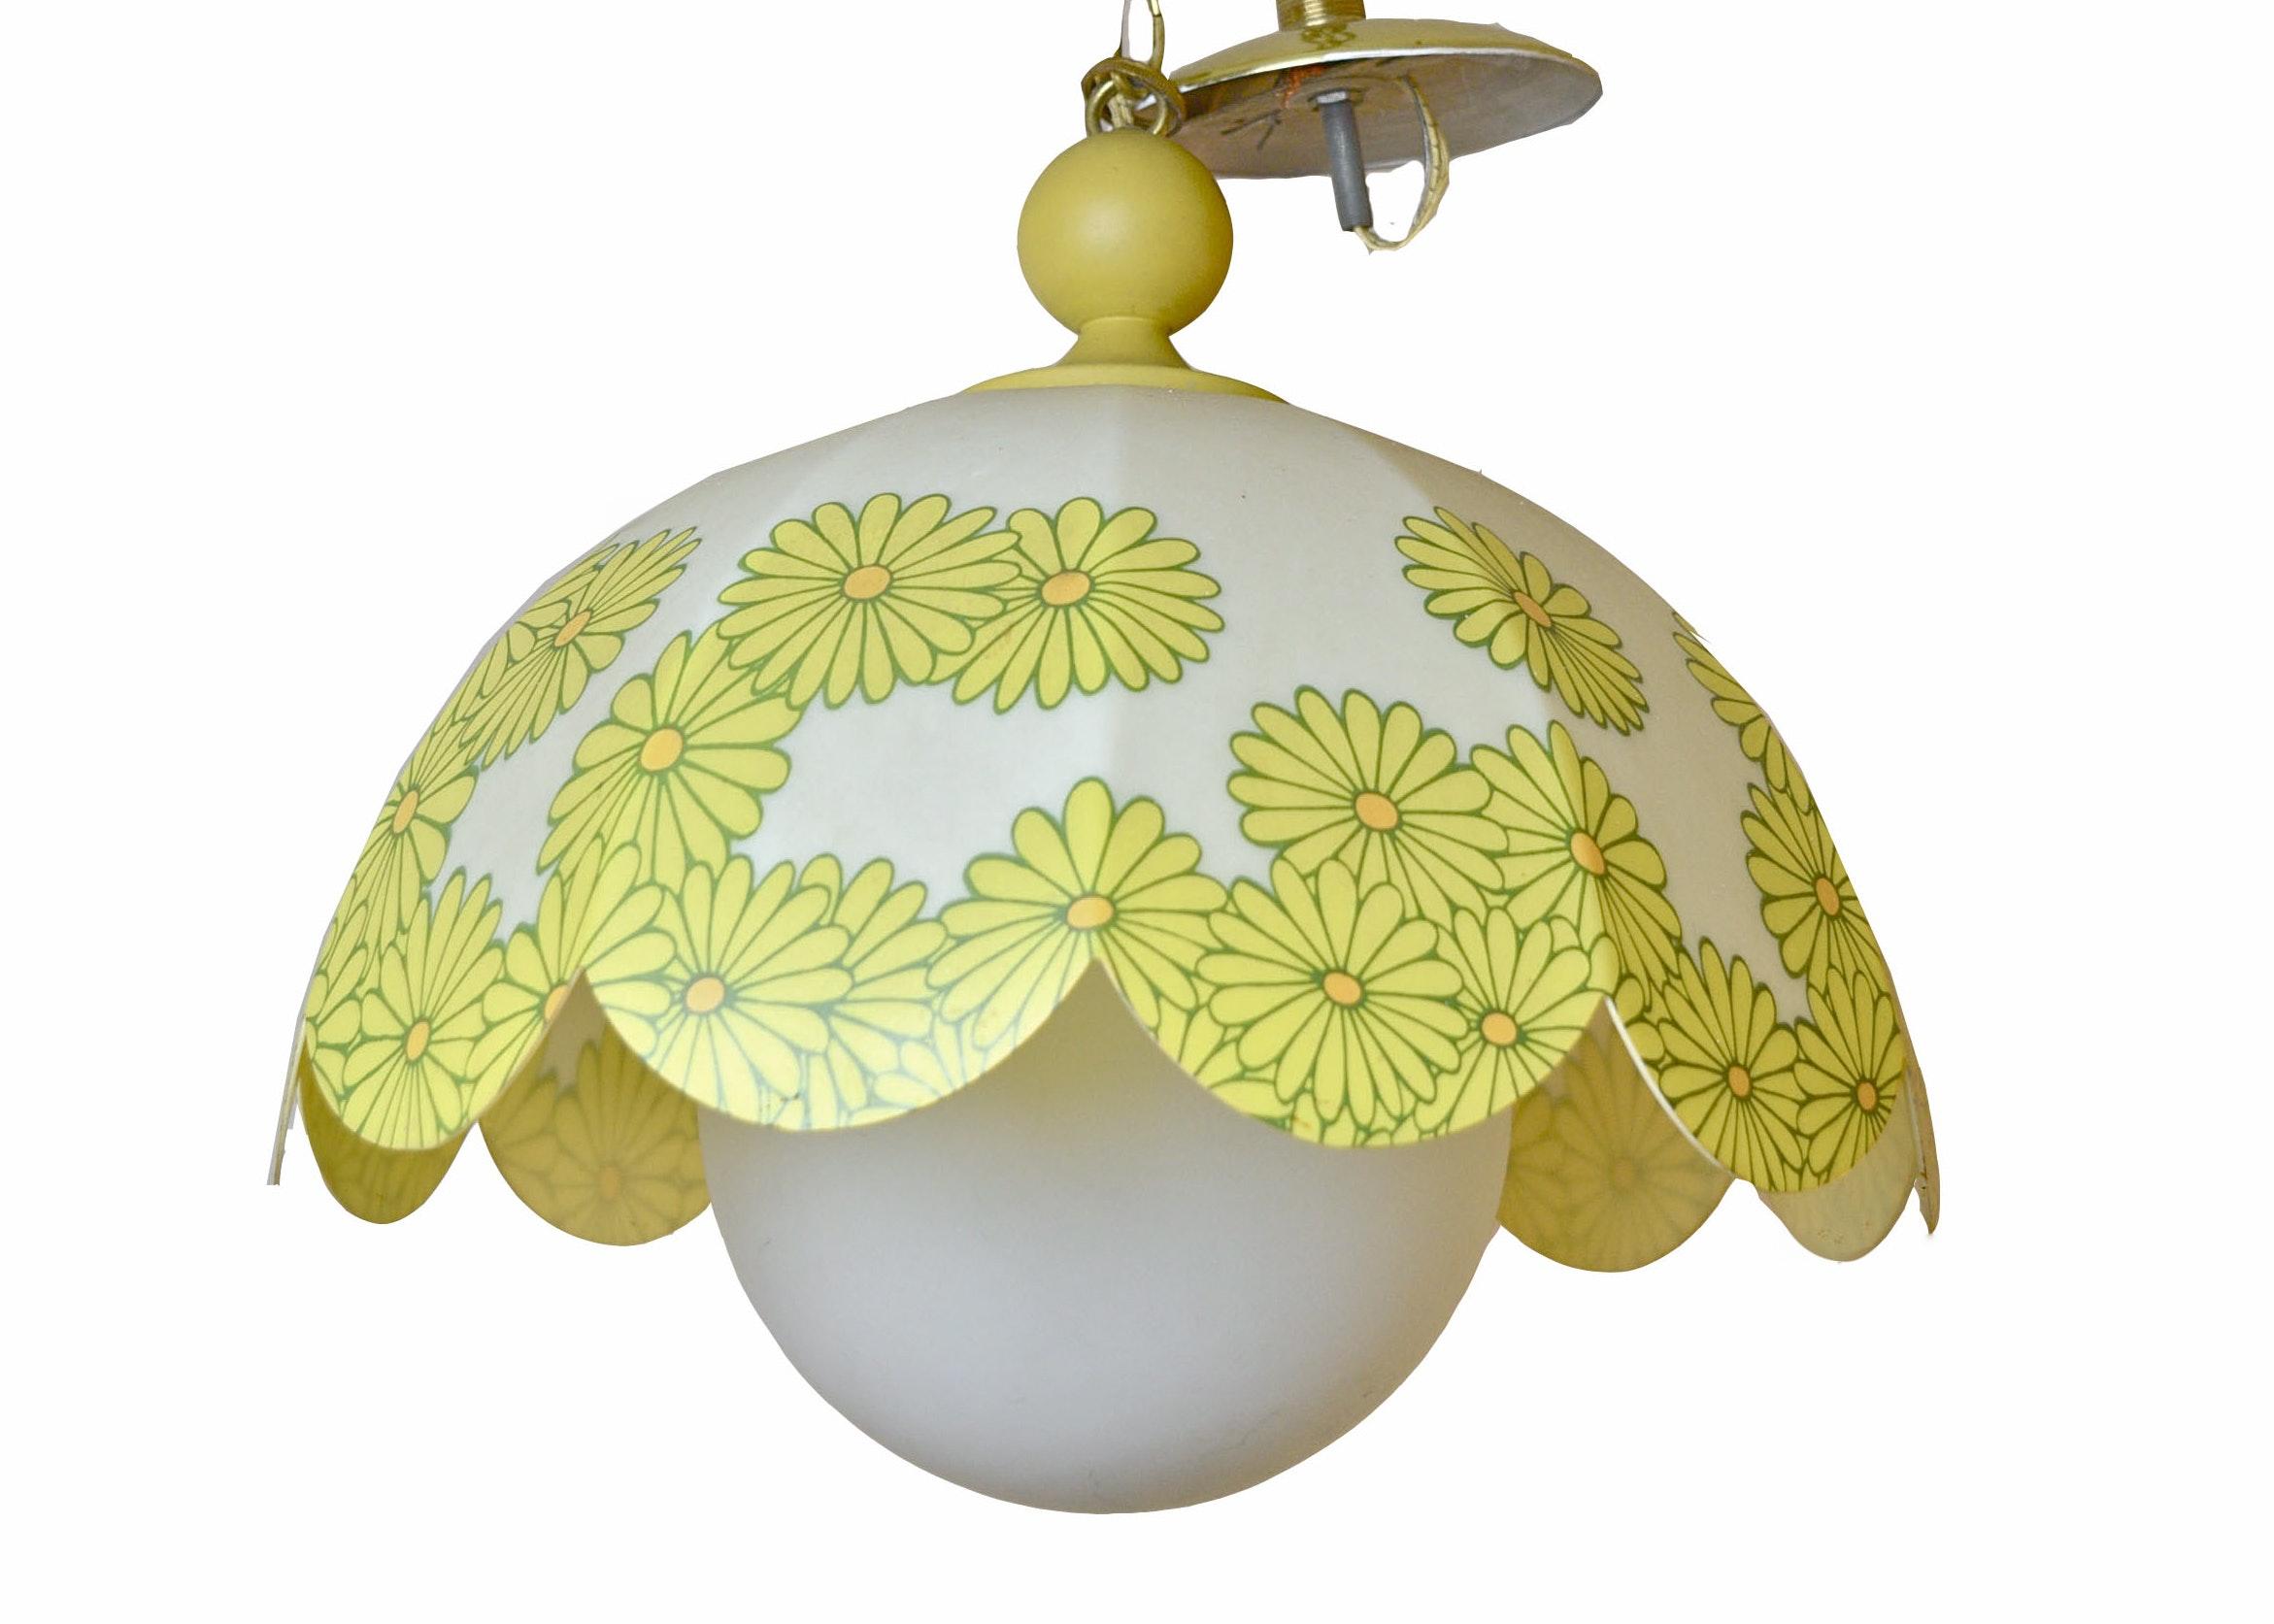 Vintage Daisy Pendant Light ...  sc 1 st  Everything But The House & Vintage Daisy Pendant Light : EBTH azcodes.com